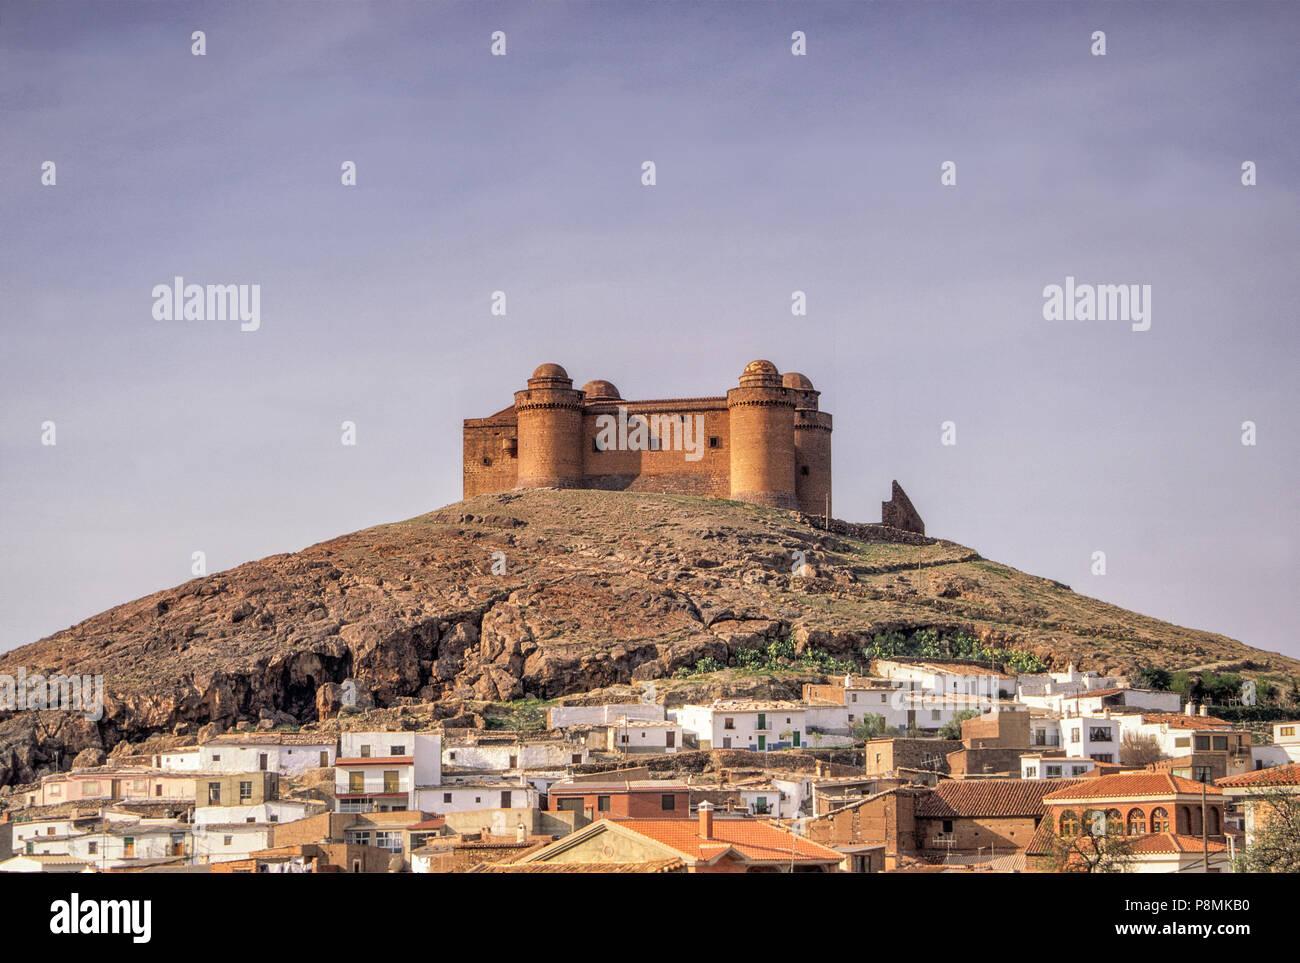 Castle above village of La Calahorra, Spain - Stock Image